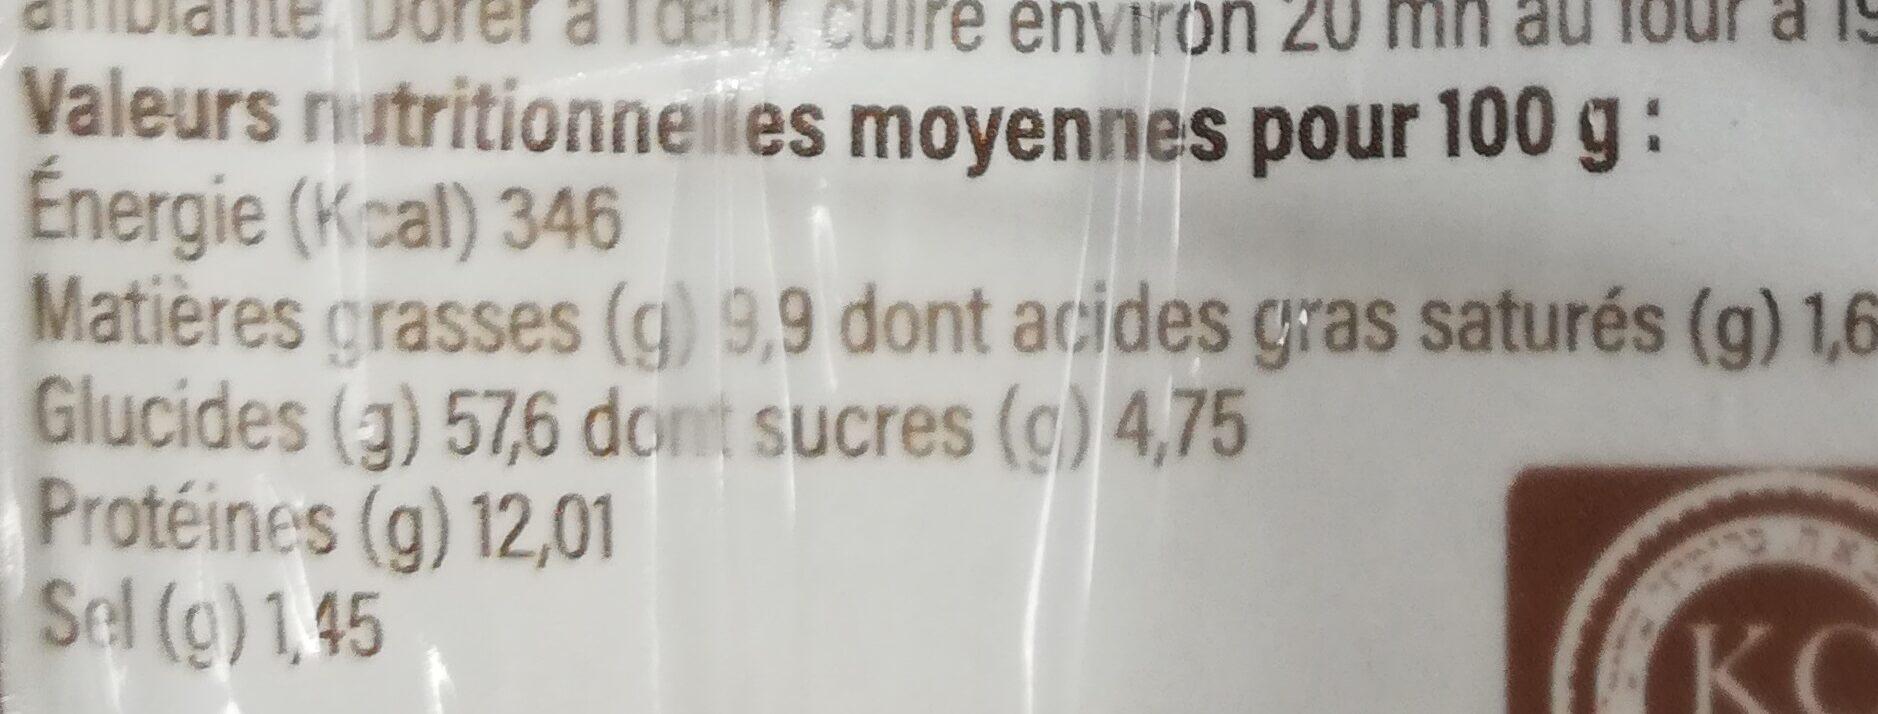 Hallots - Informations nutritionnelles - fr